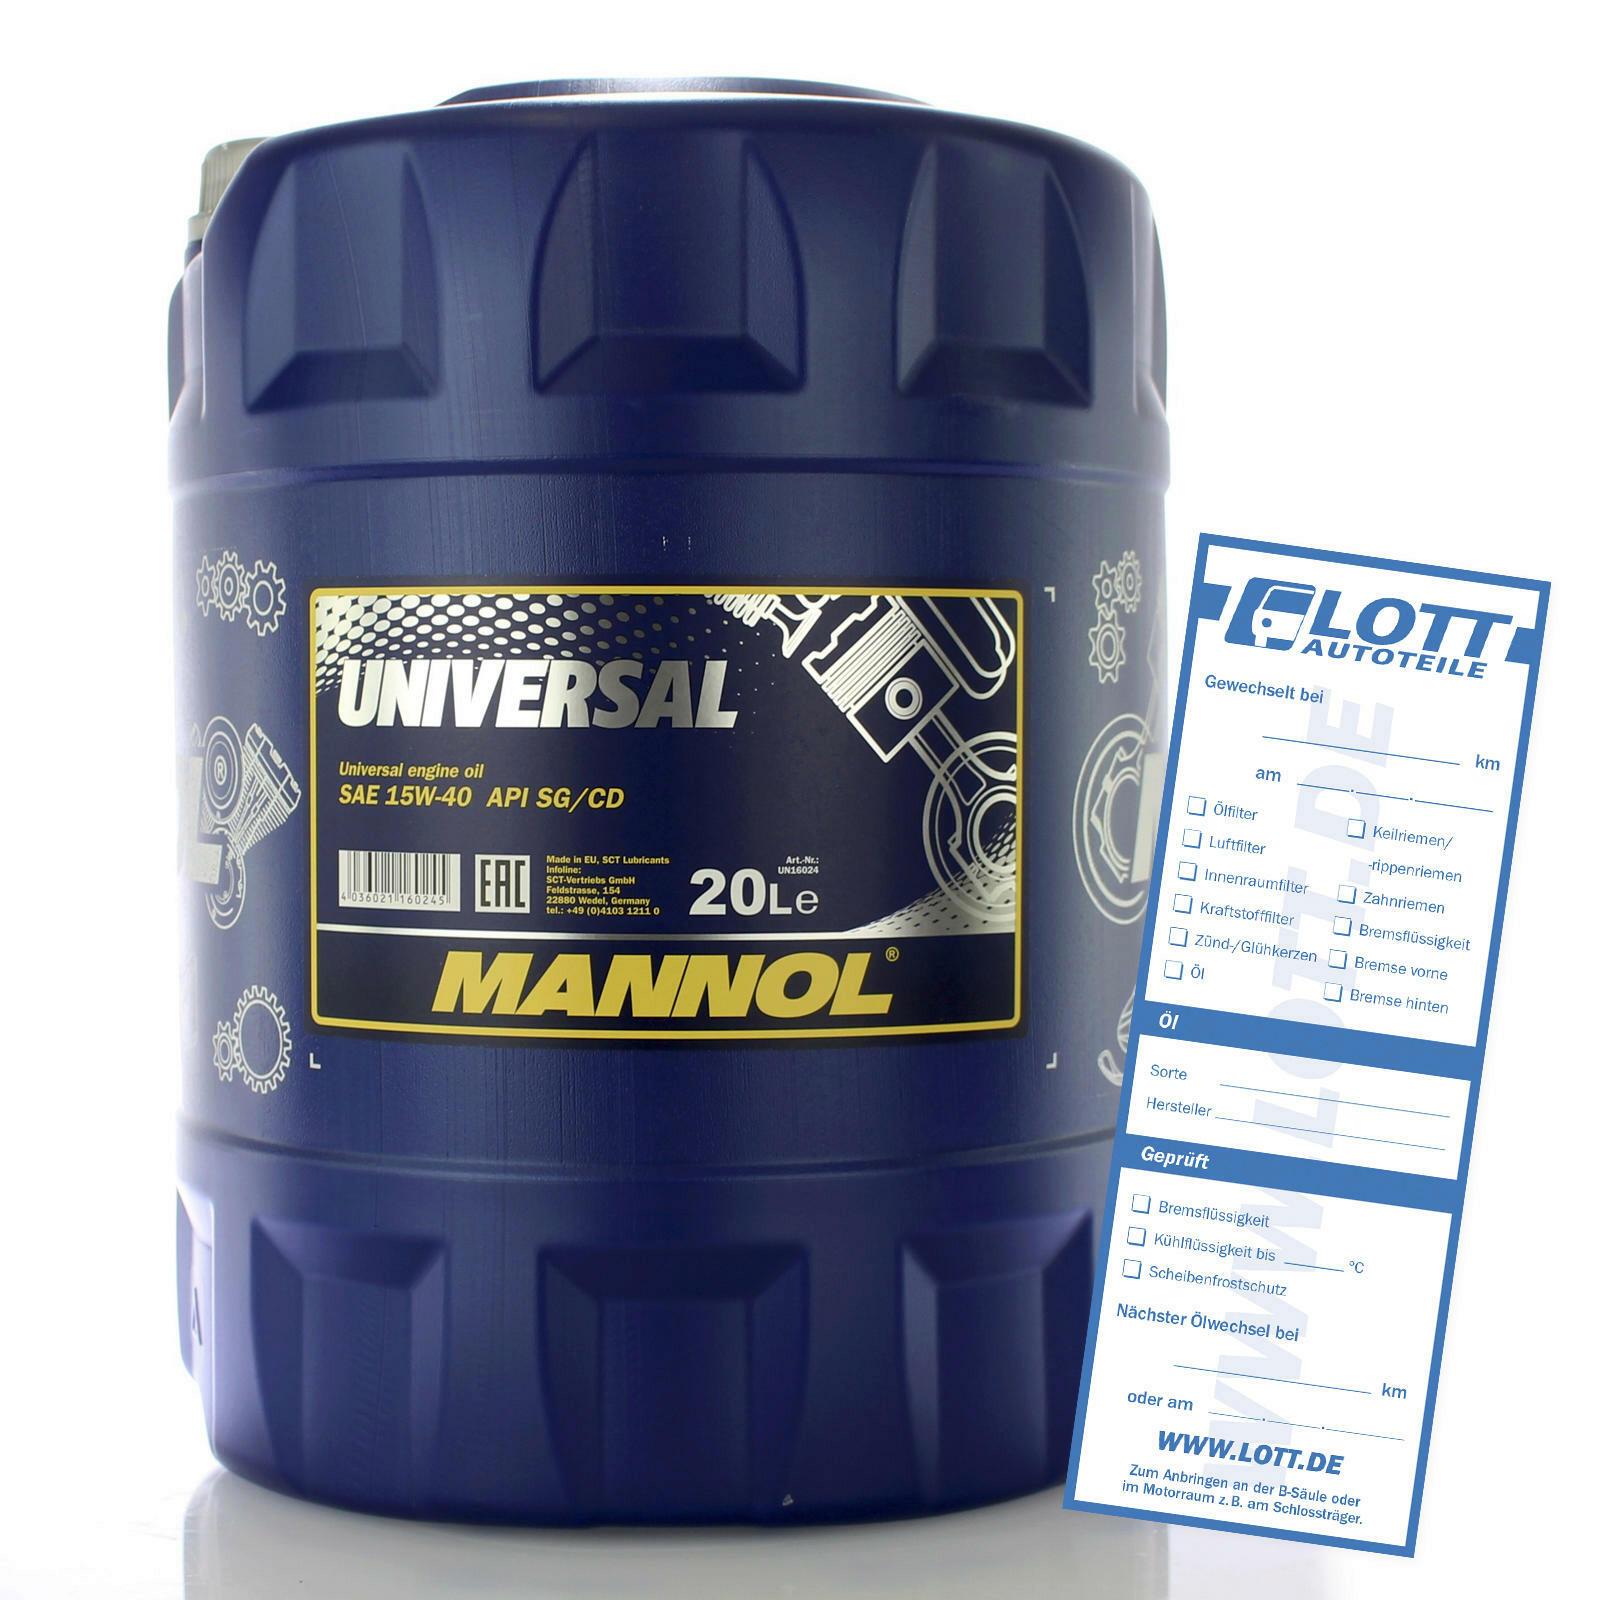 Mannol Universal 15W-40 20L